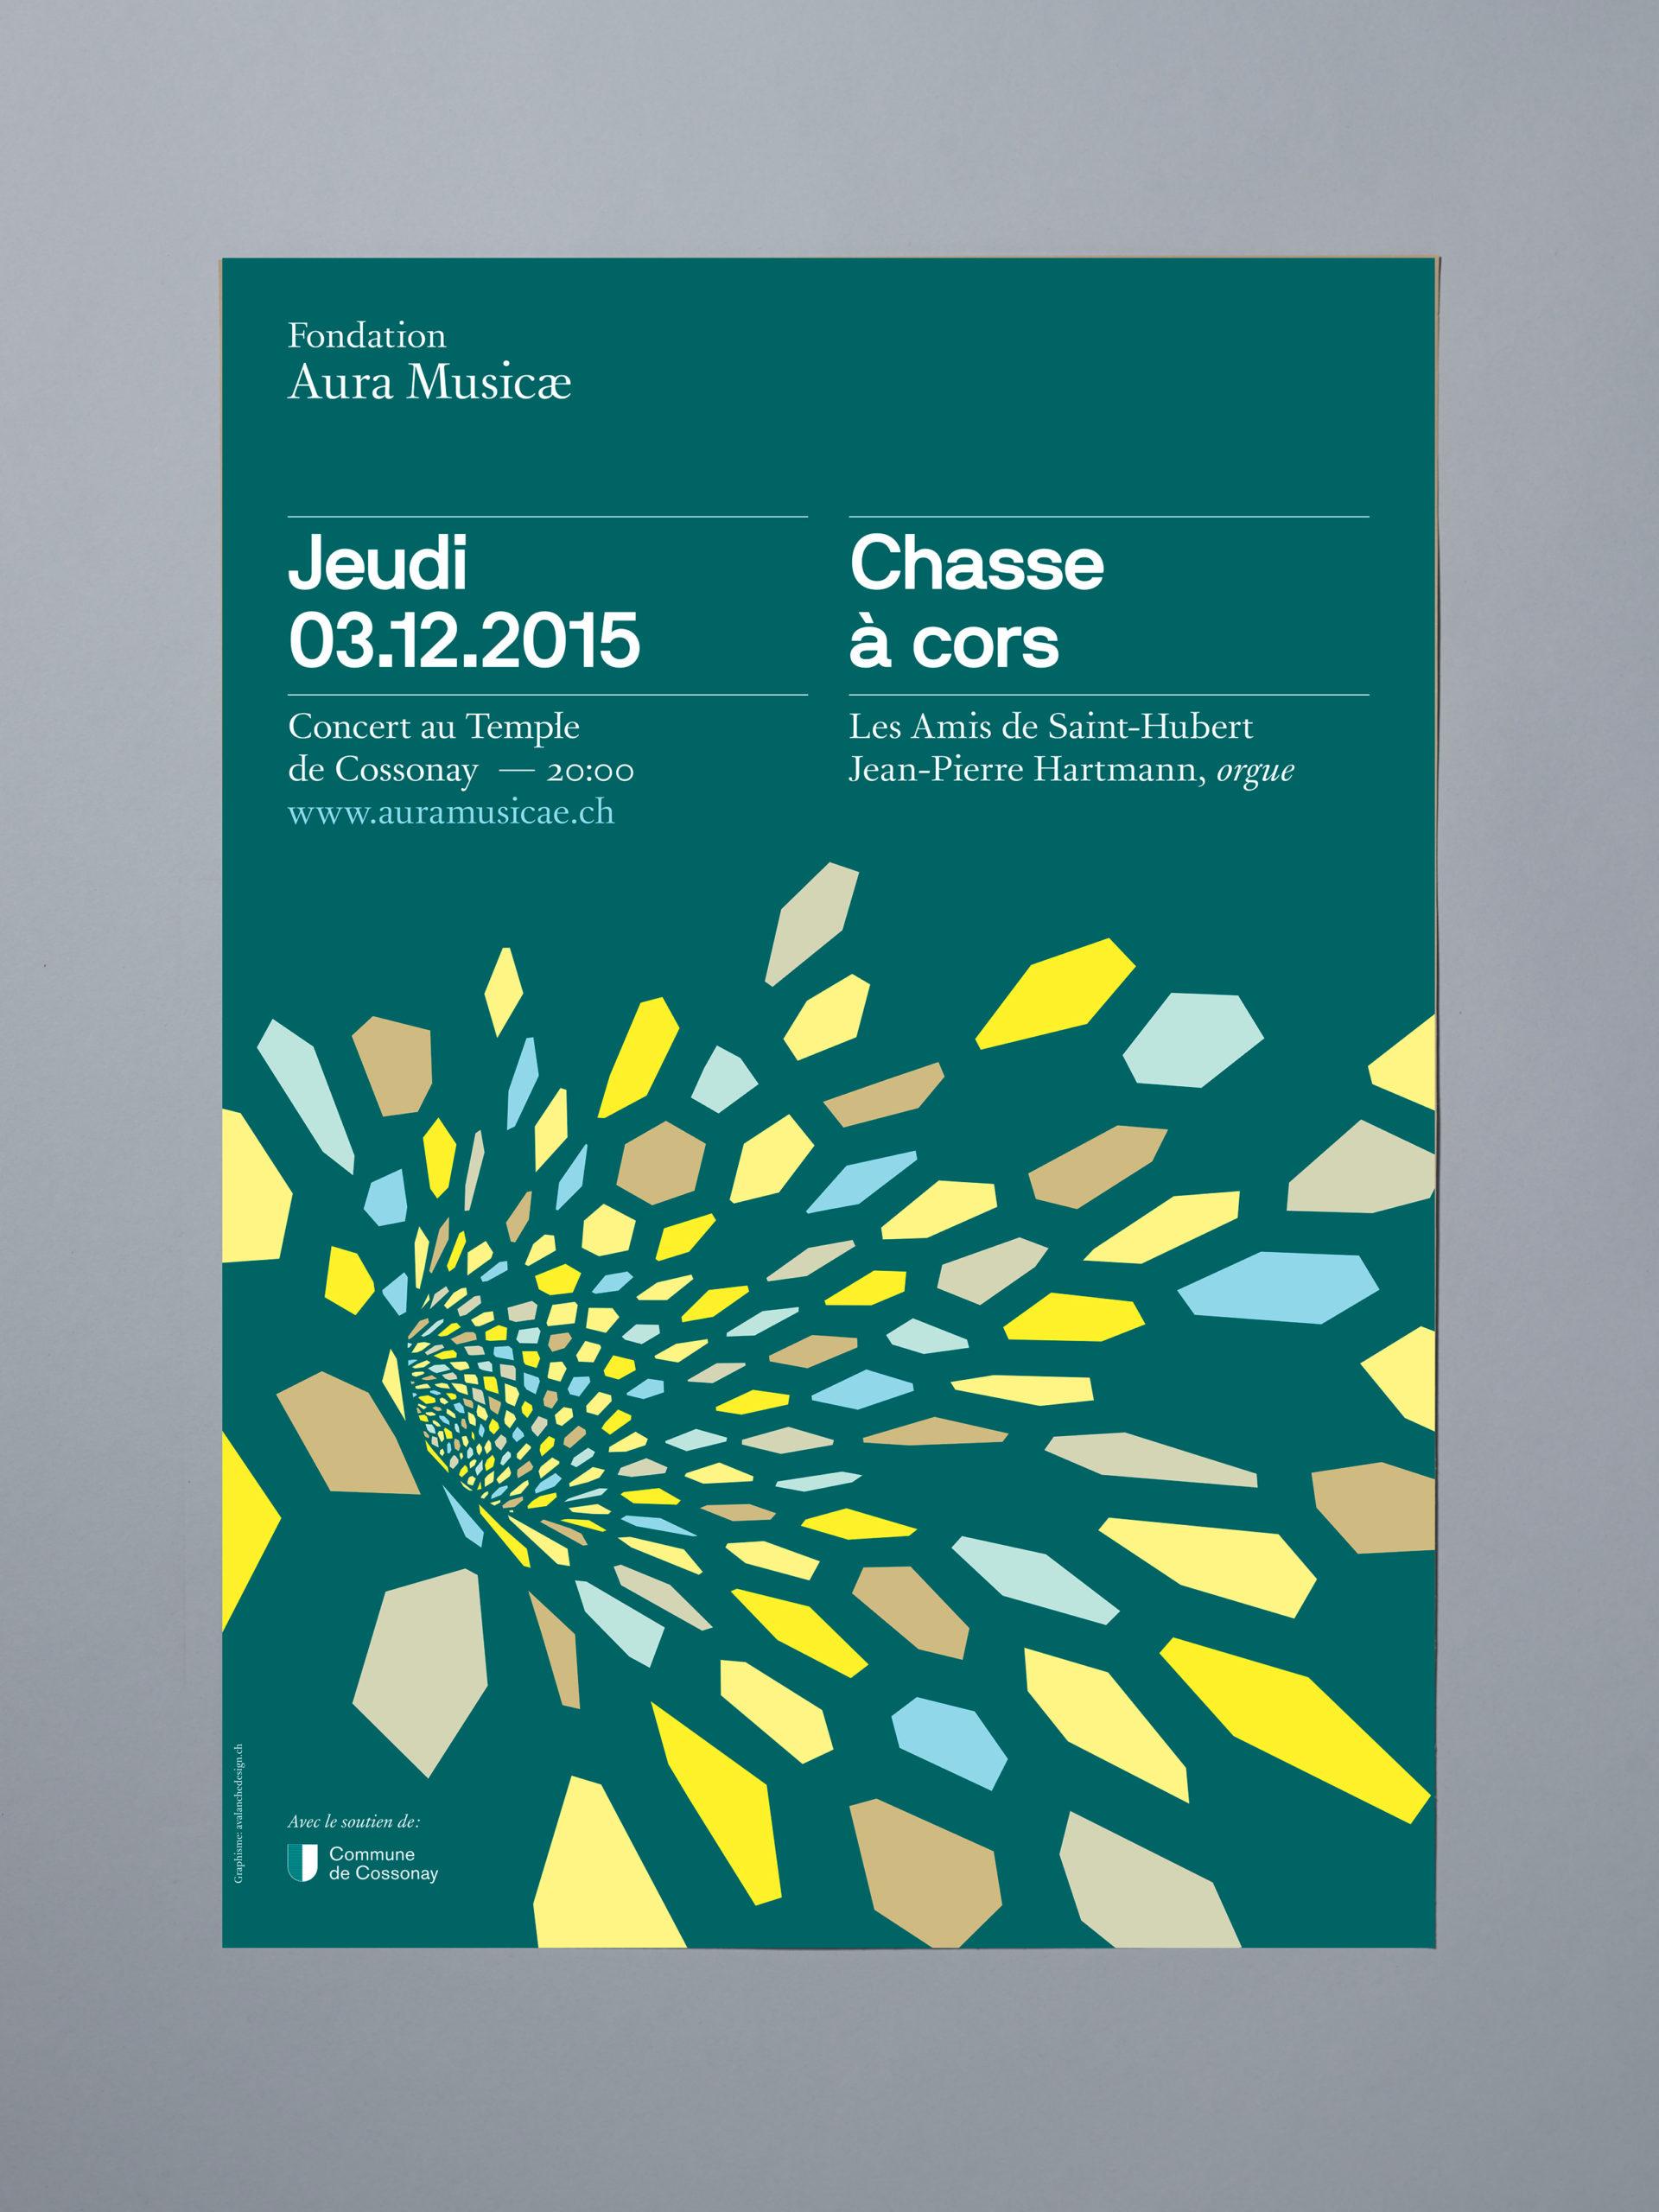 Aura Musicae - Avalanche